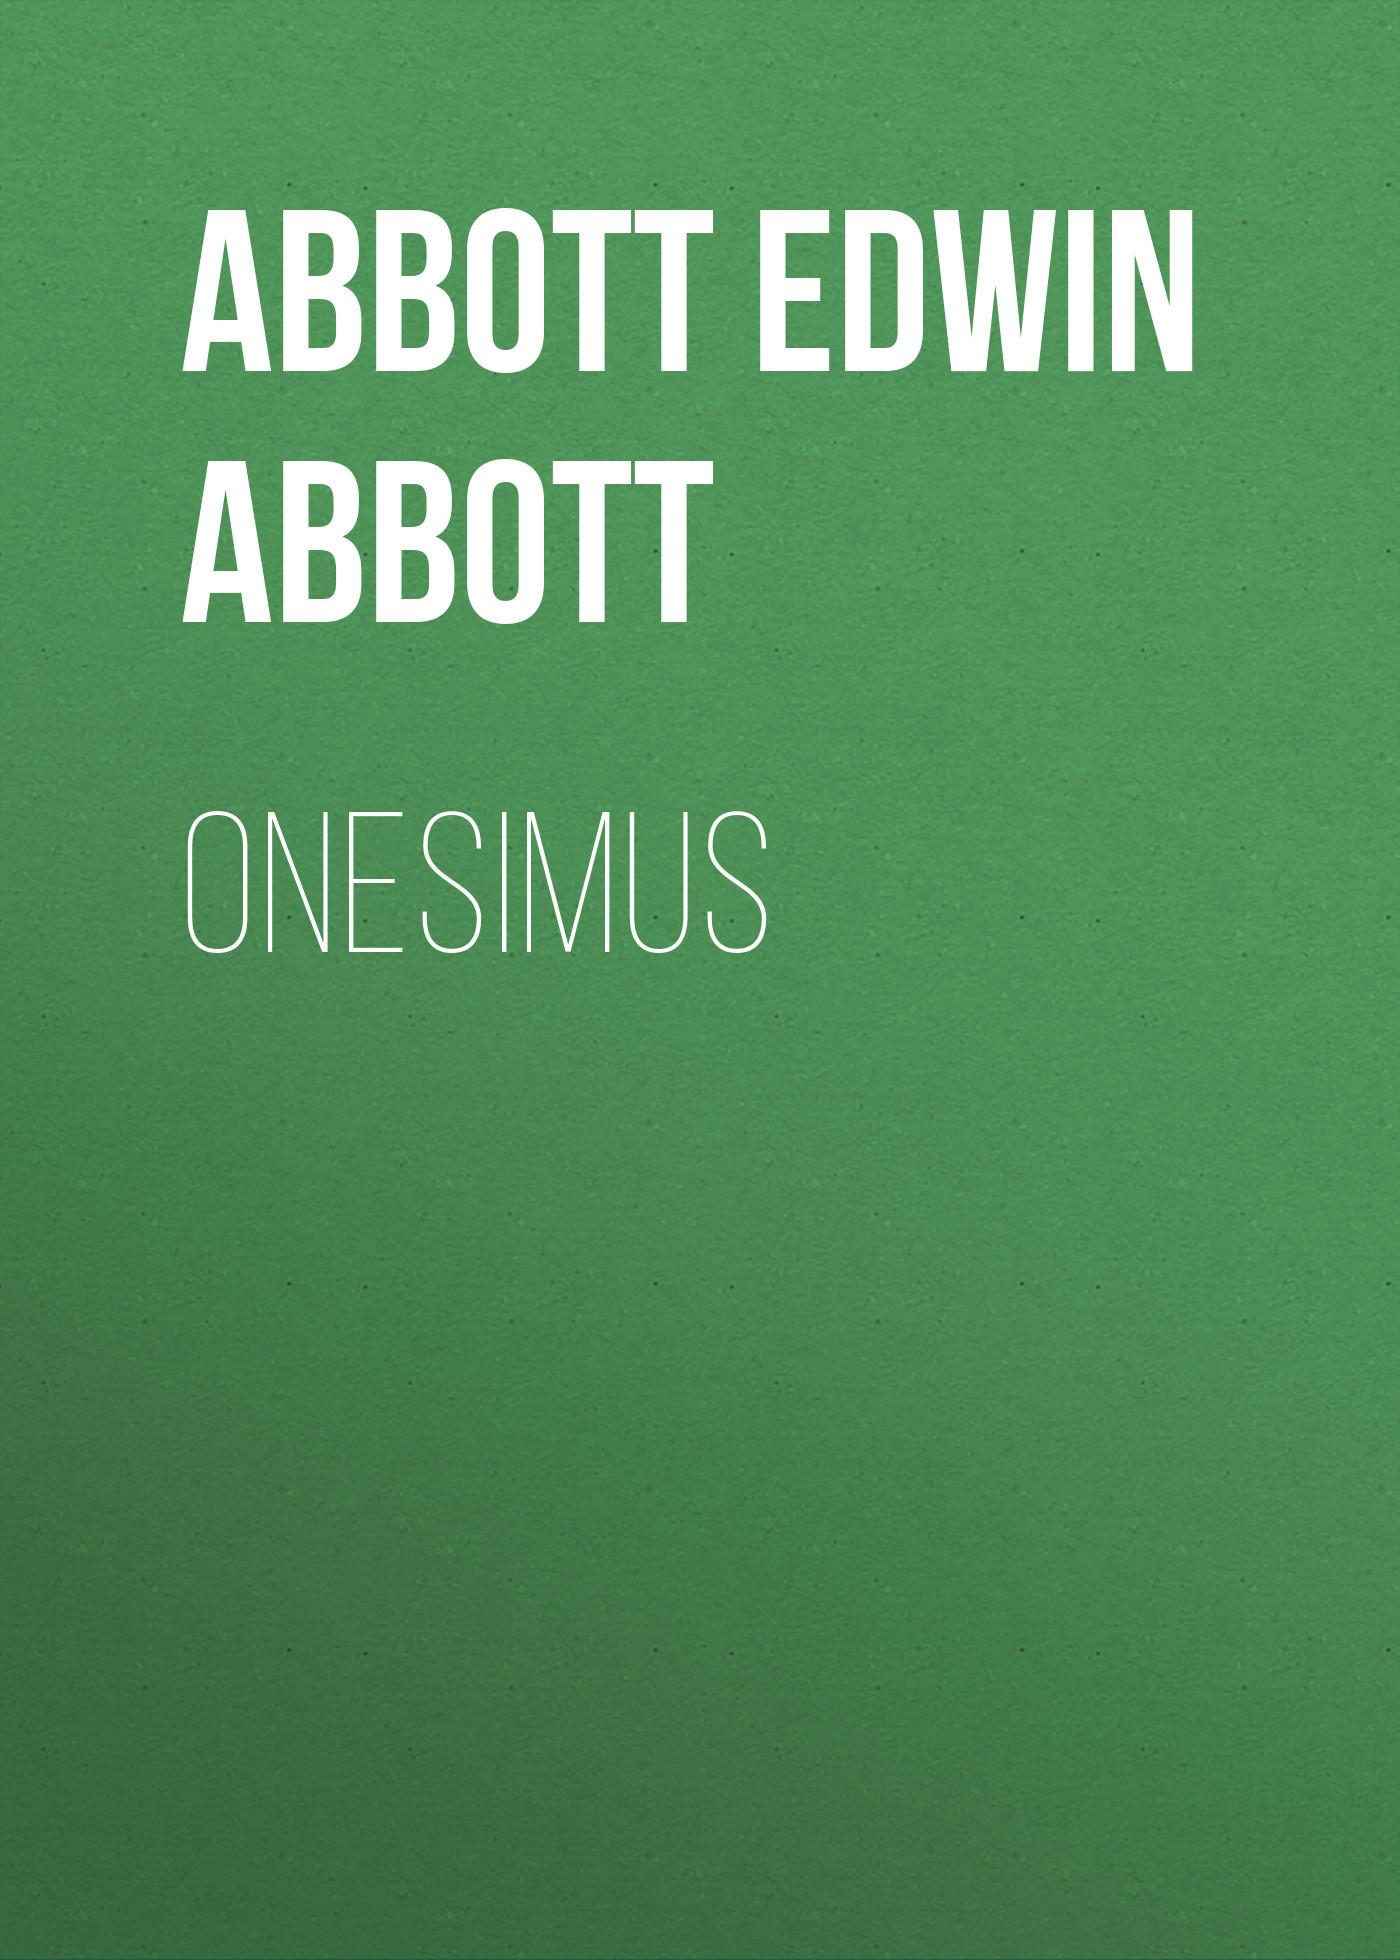 Abbott Edwin Abbott Onesimus abbott 100 0 12 370g